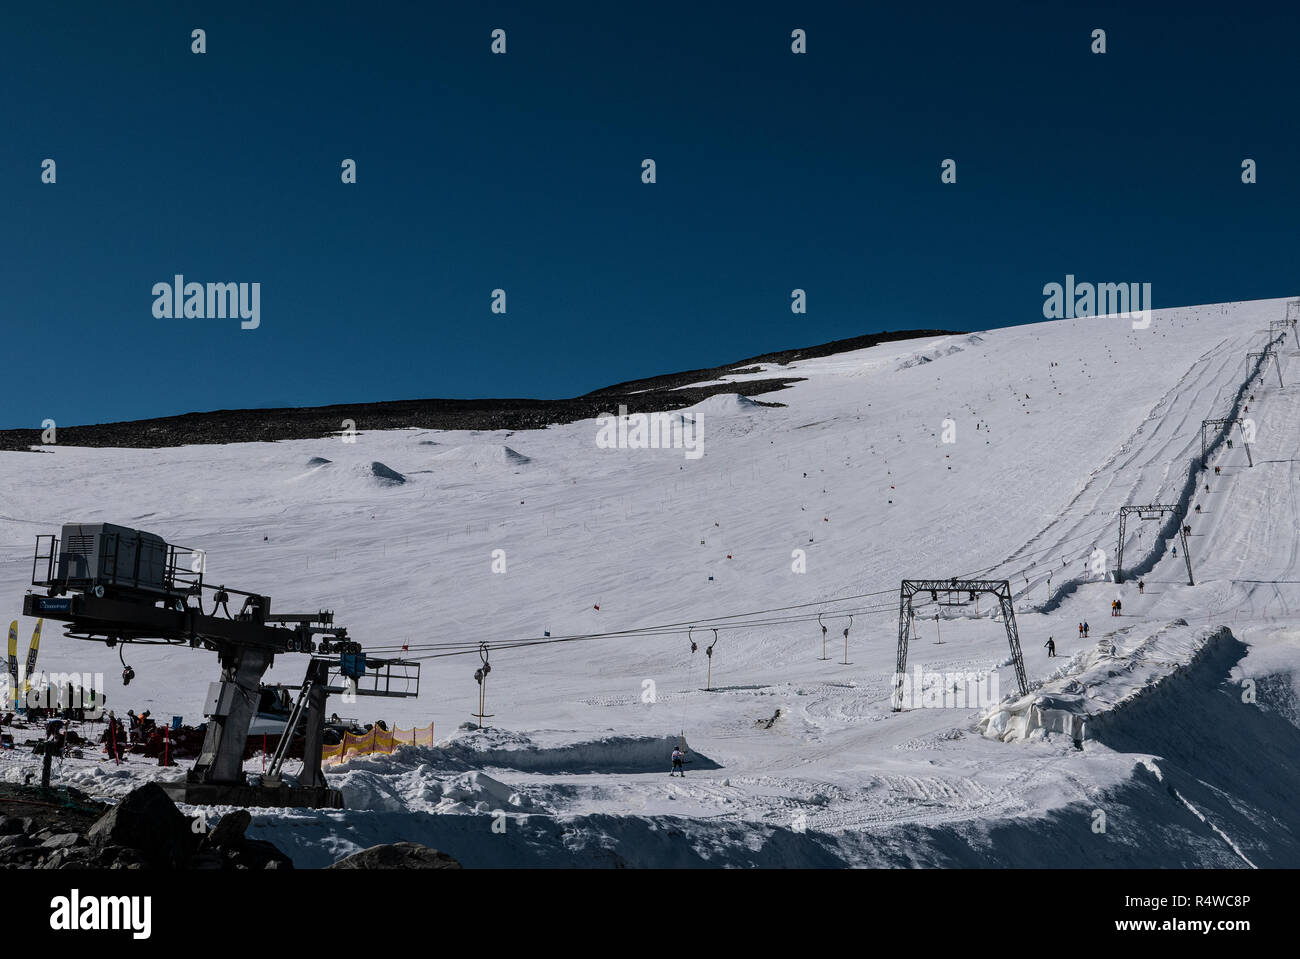 Galdhøpiggen sommarskisenter/Juvass at 1850meters+ offers summerskiing and snowboarding during summer and fall at Vesljuvbreen glacier - Stock Image